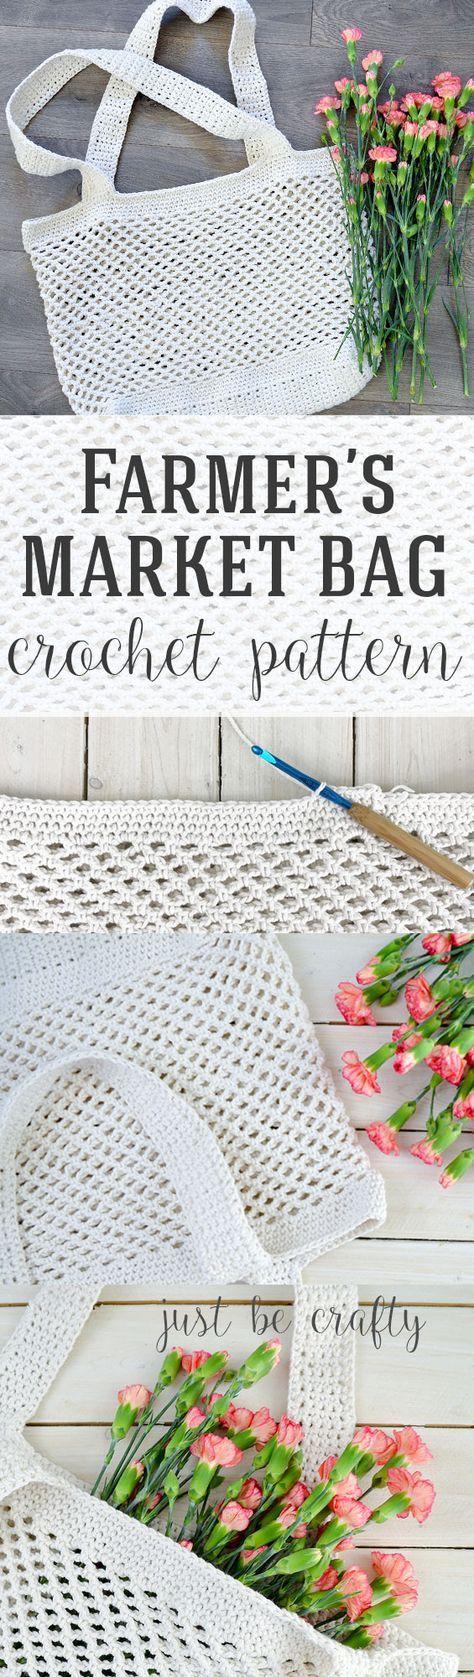 296 best Crochet Fun images on Pinterest | Crochet patterns, Crochet ...